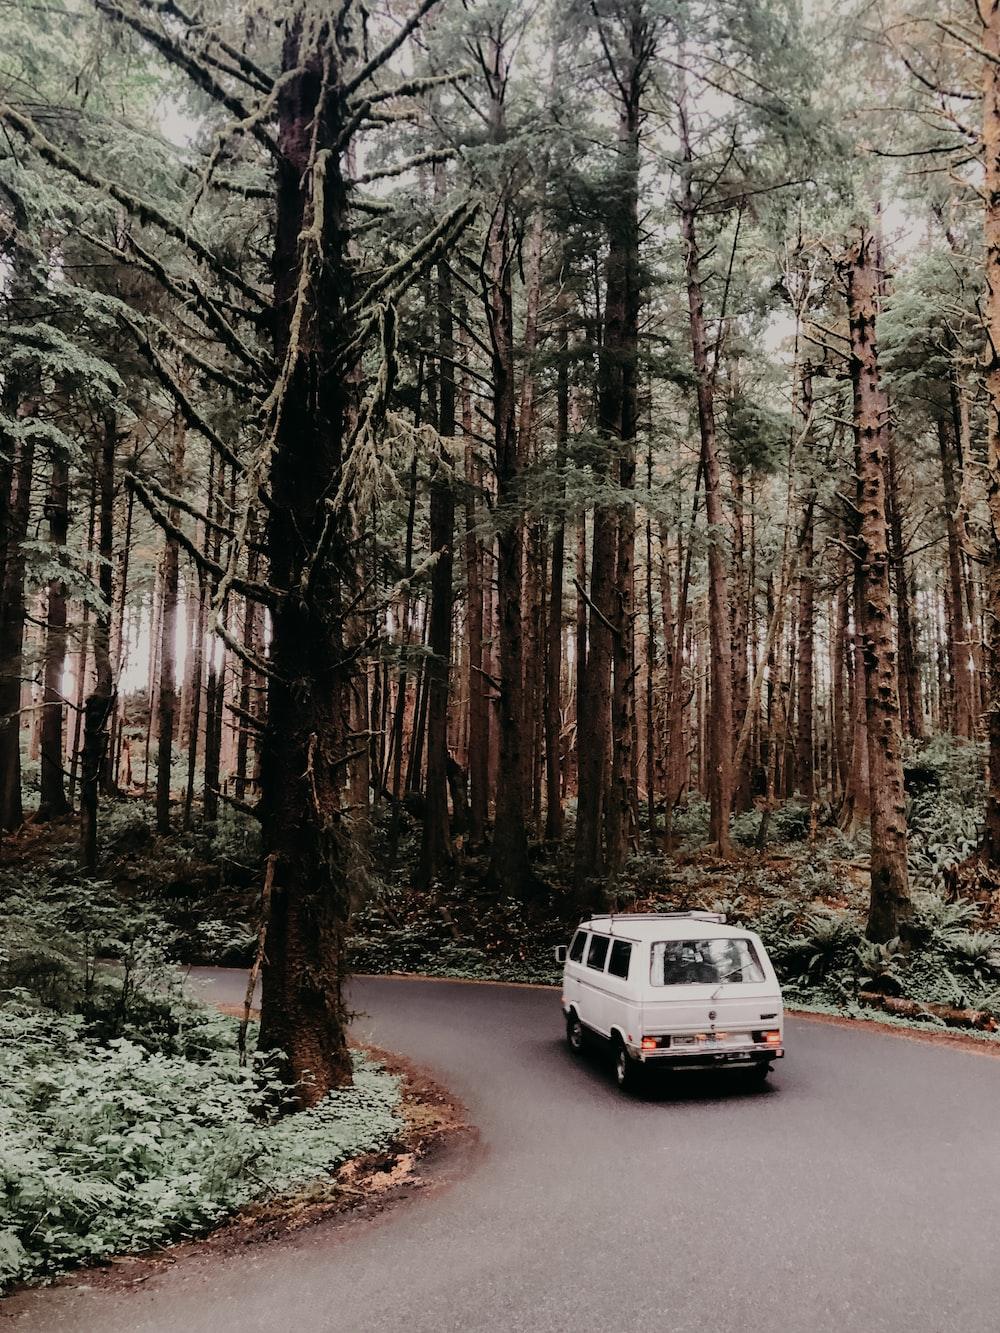 white van traveling on road